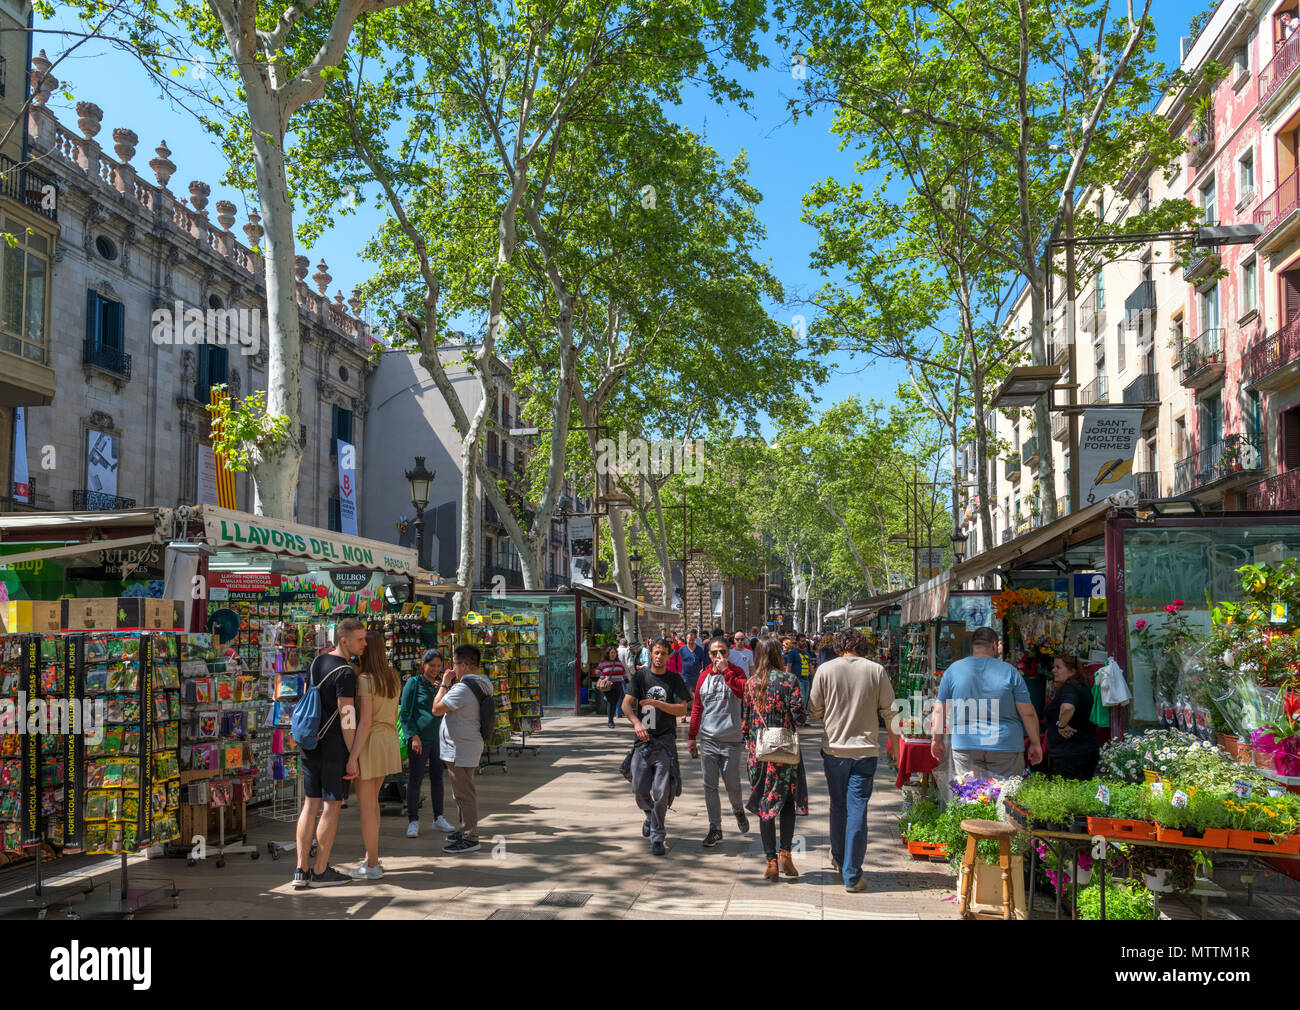 Las Ramblas, Barcelona. Stalls along the busy Rambla Sant Josep, Barcelona, Catalunya, Spain. - Stock Image